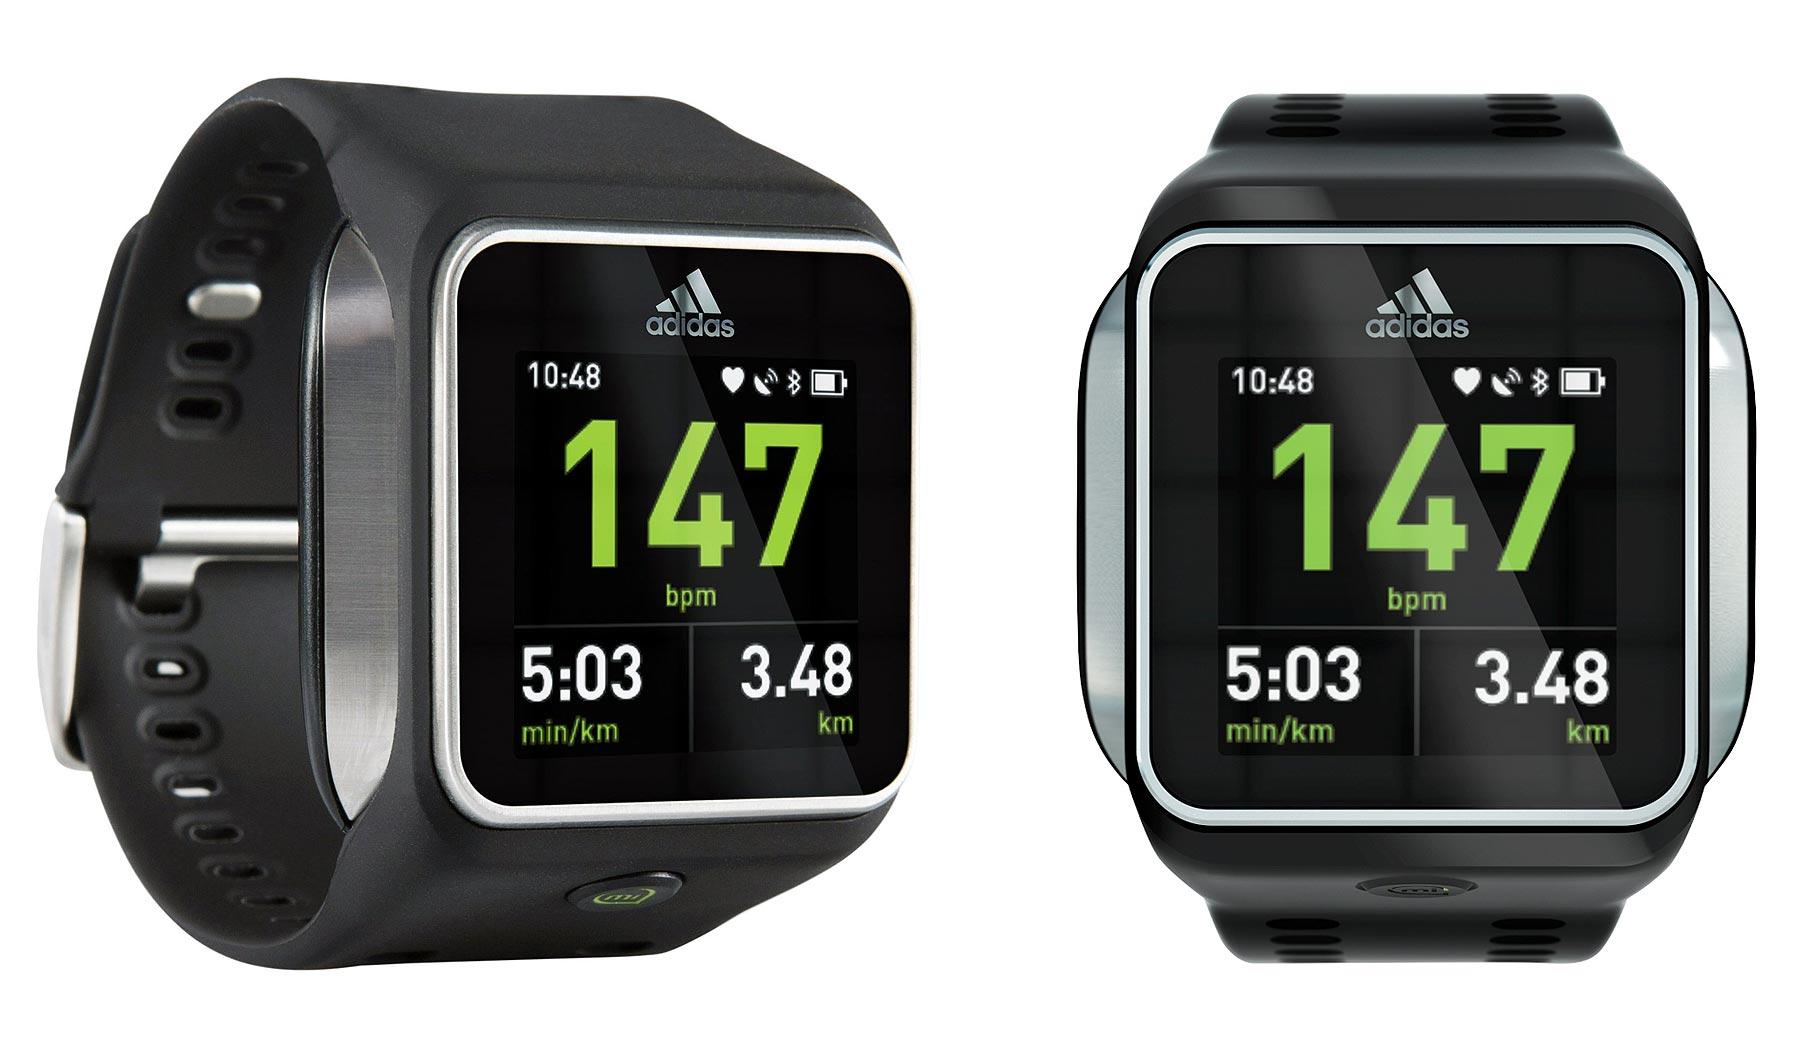 Adidas miCoach Smart Run